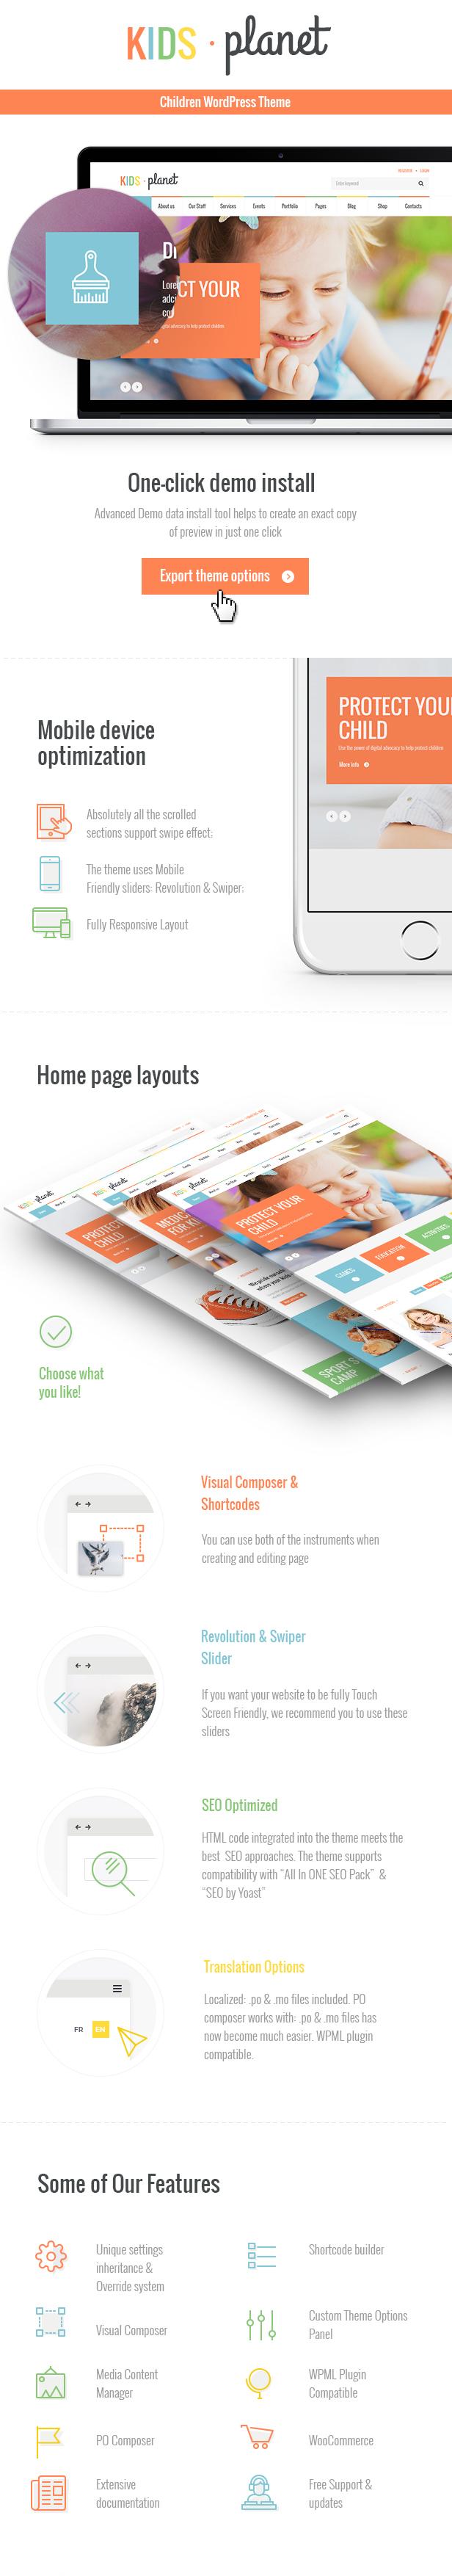 Kids Planet - A Multipurpose Children WordPress Theme features